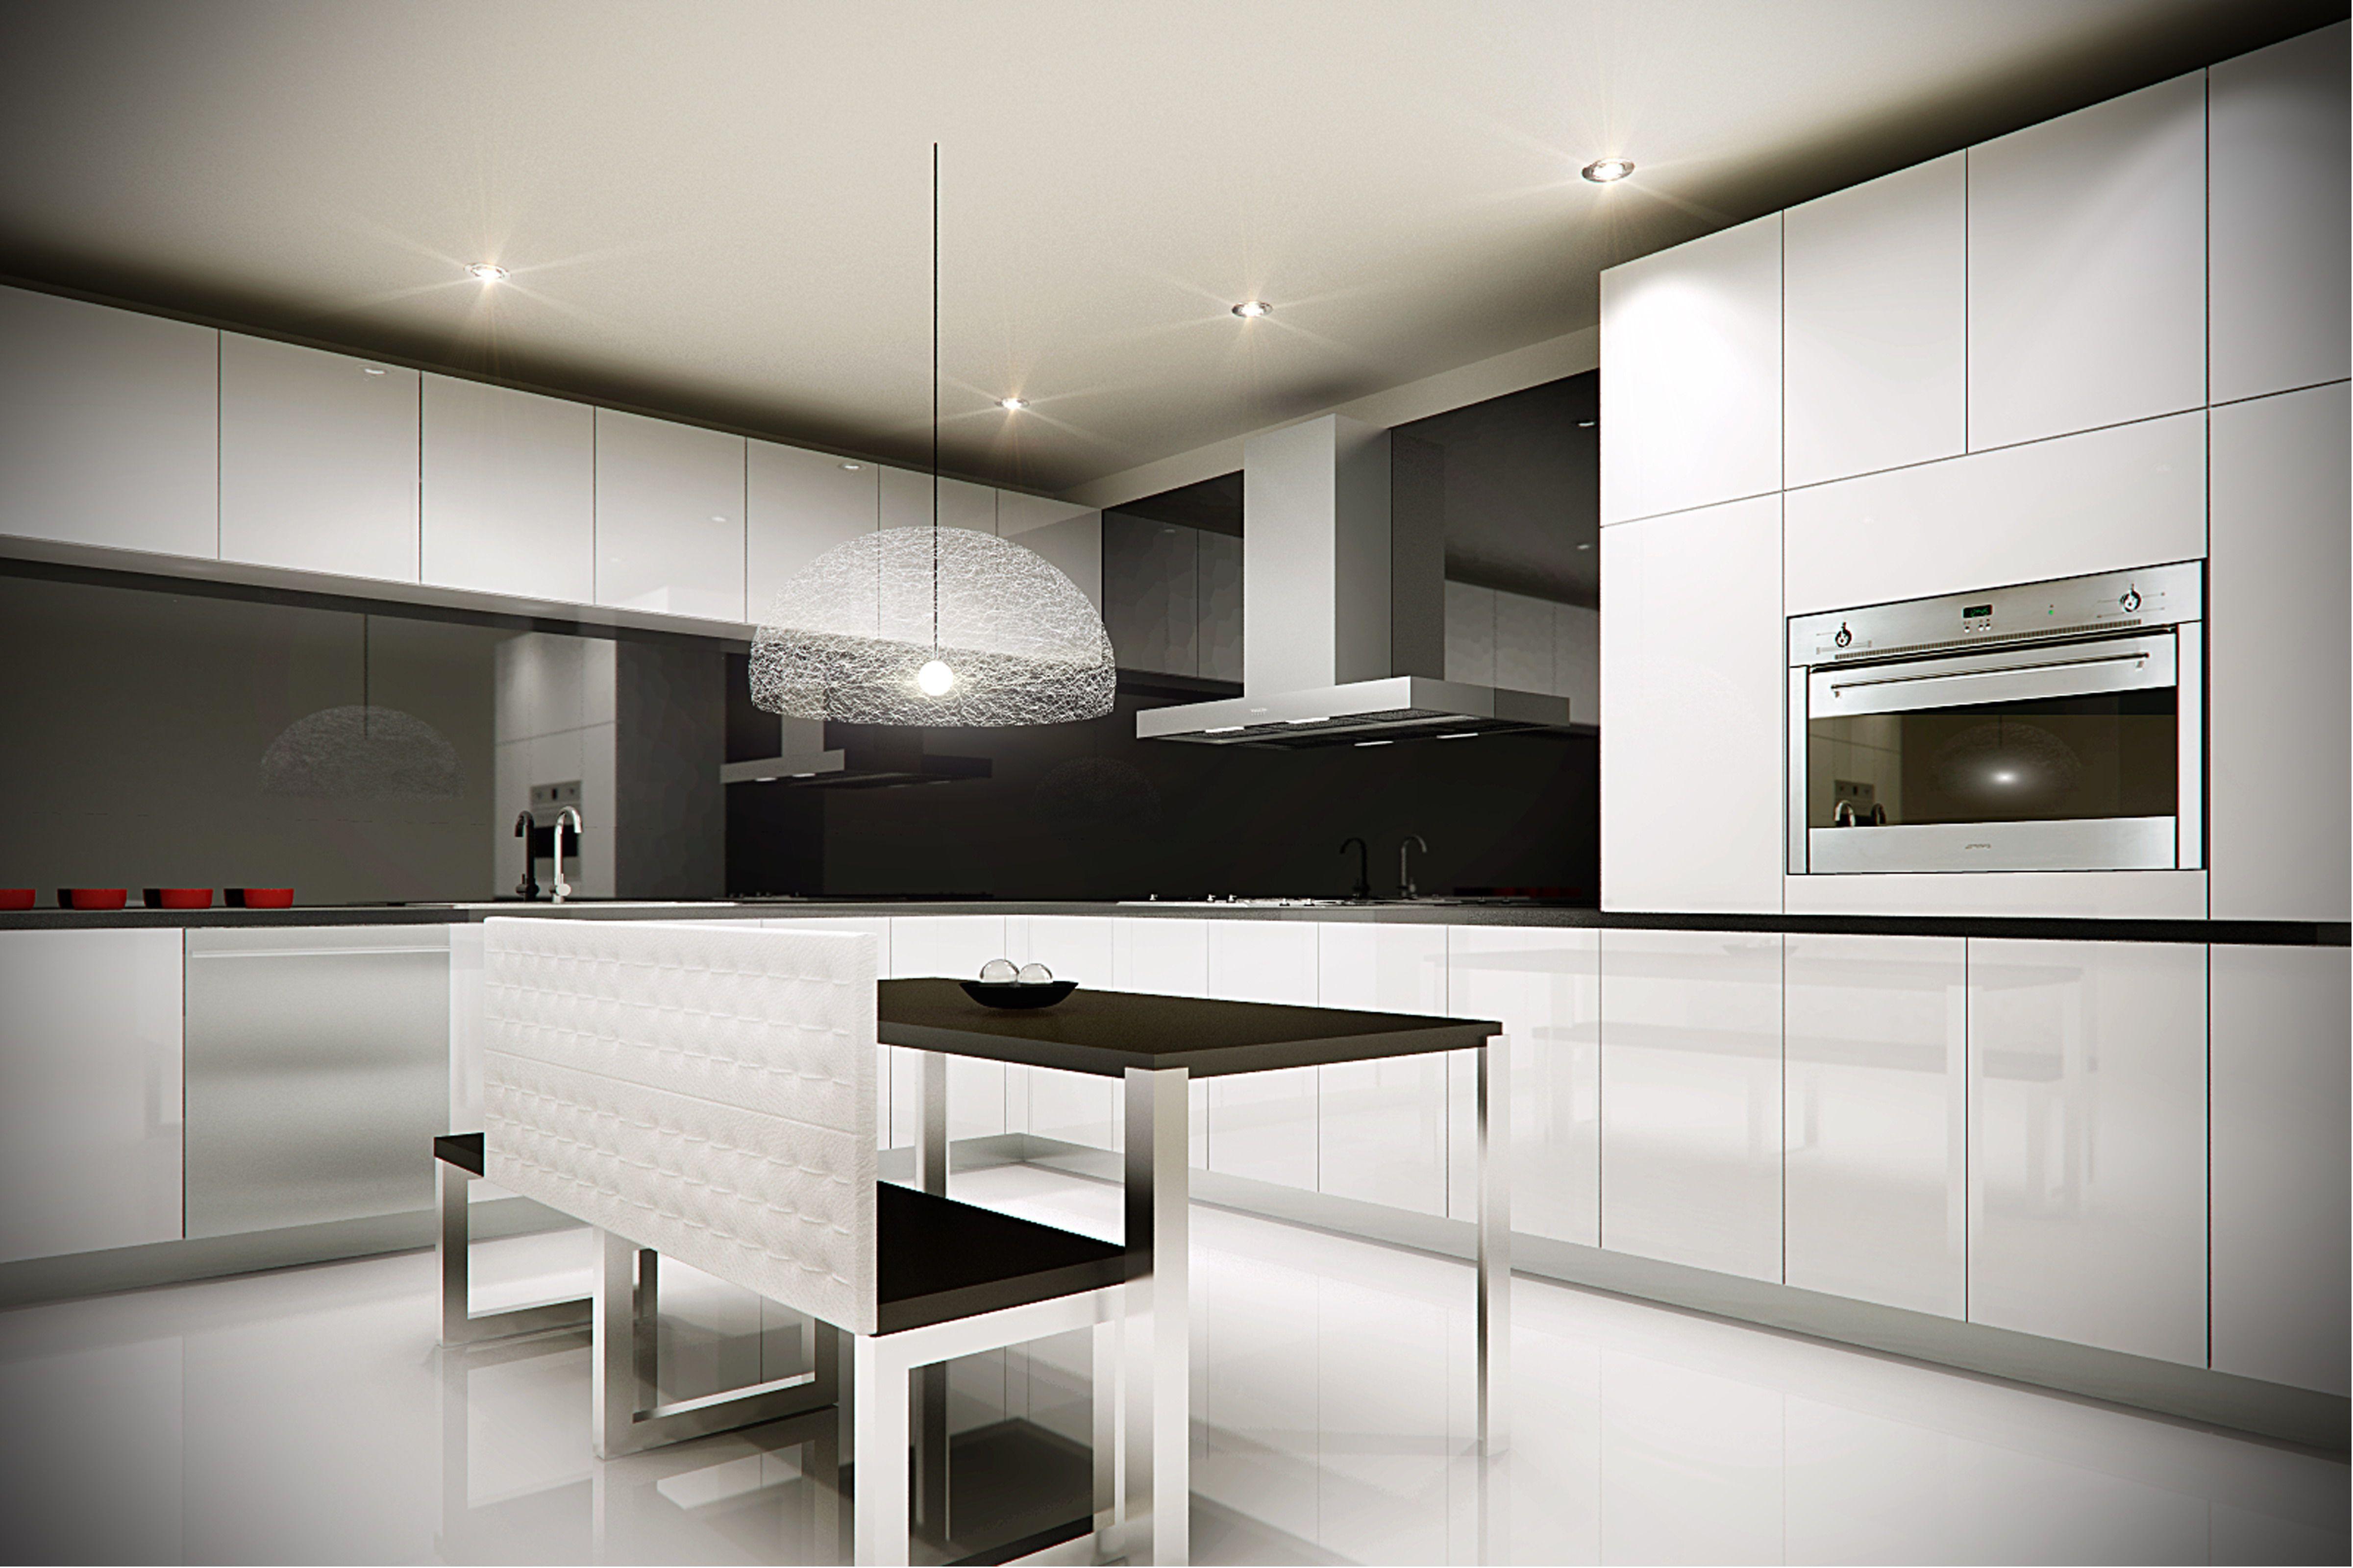 Cocina minimalista horno de gas y campana smeg cocinas - Campanas de cocina modernas ...